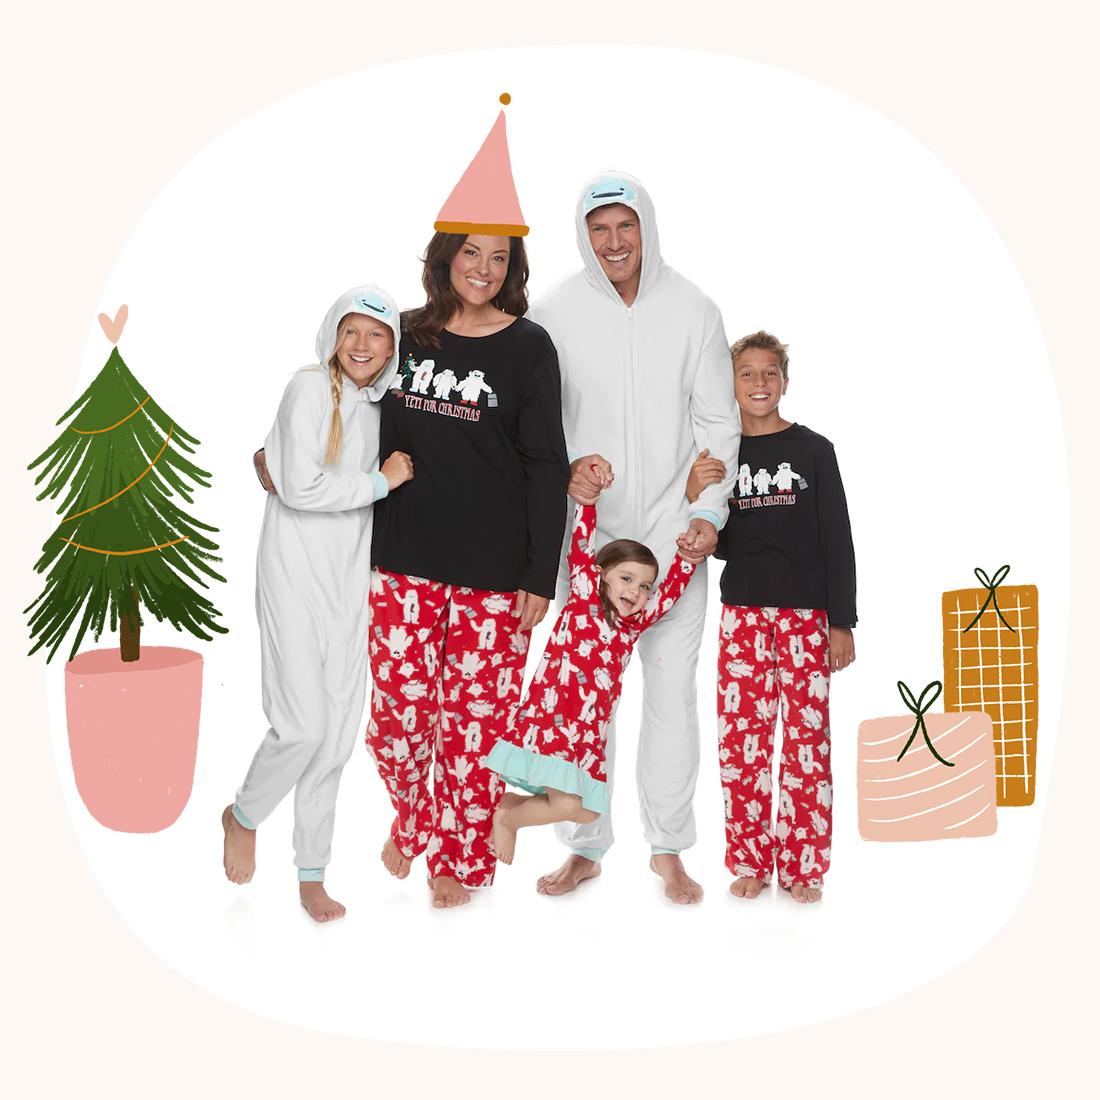 Kohls-Holiday-2018_Custom-Designed-Article_6.jpg